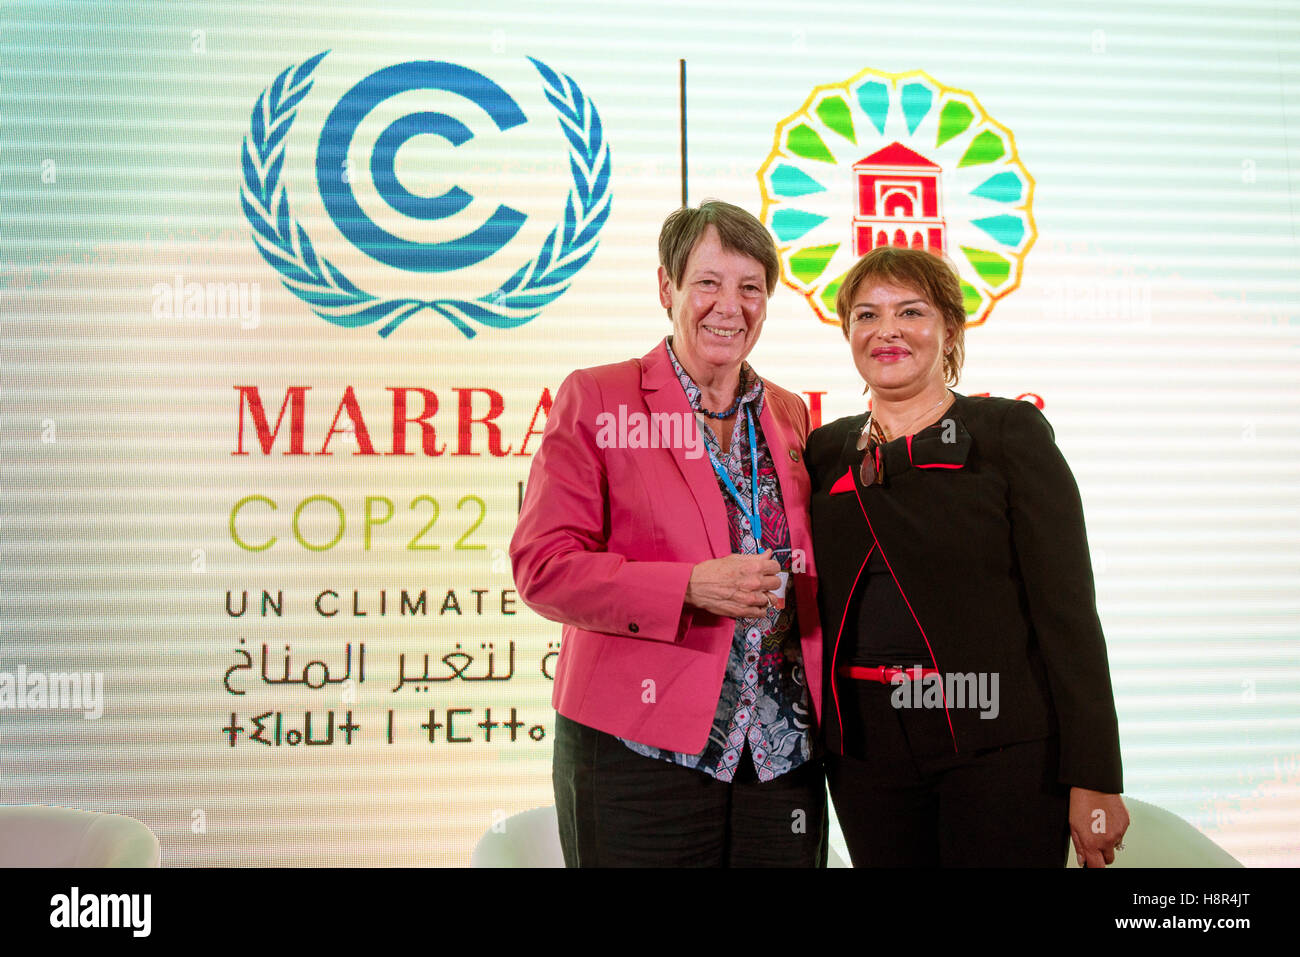 Marrakech, Morocco. 15th Nov, 2016. The German Federal Minister of the Environment Barbara Hendricks and Moroccan Stock Photo